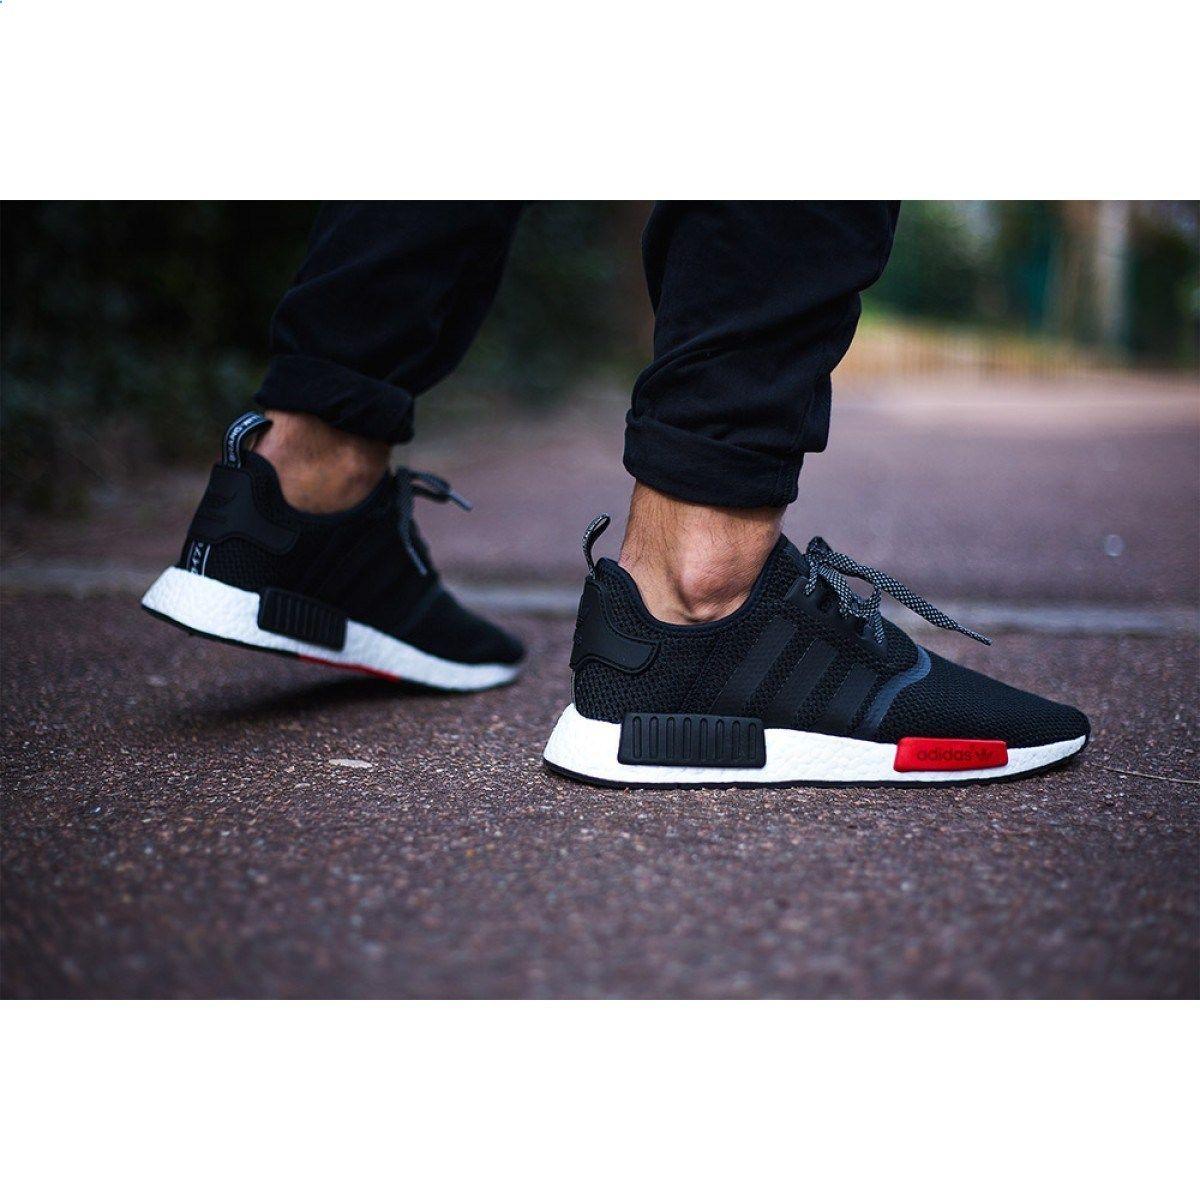 Adidas Nmd R1 Footlocker Exclusive Black Red White Aq4498 Sport